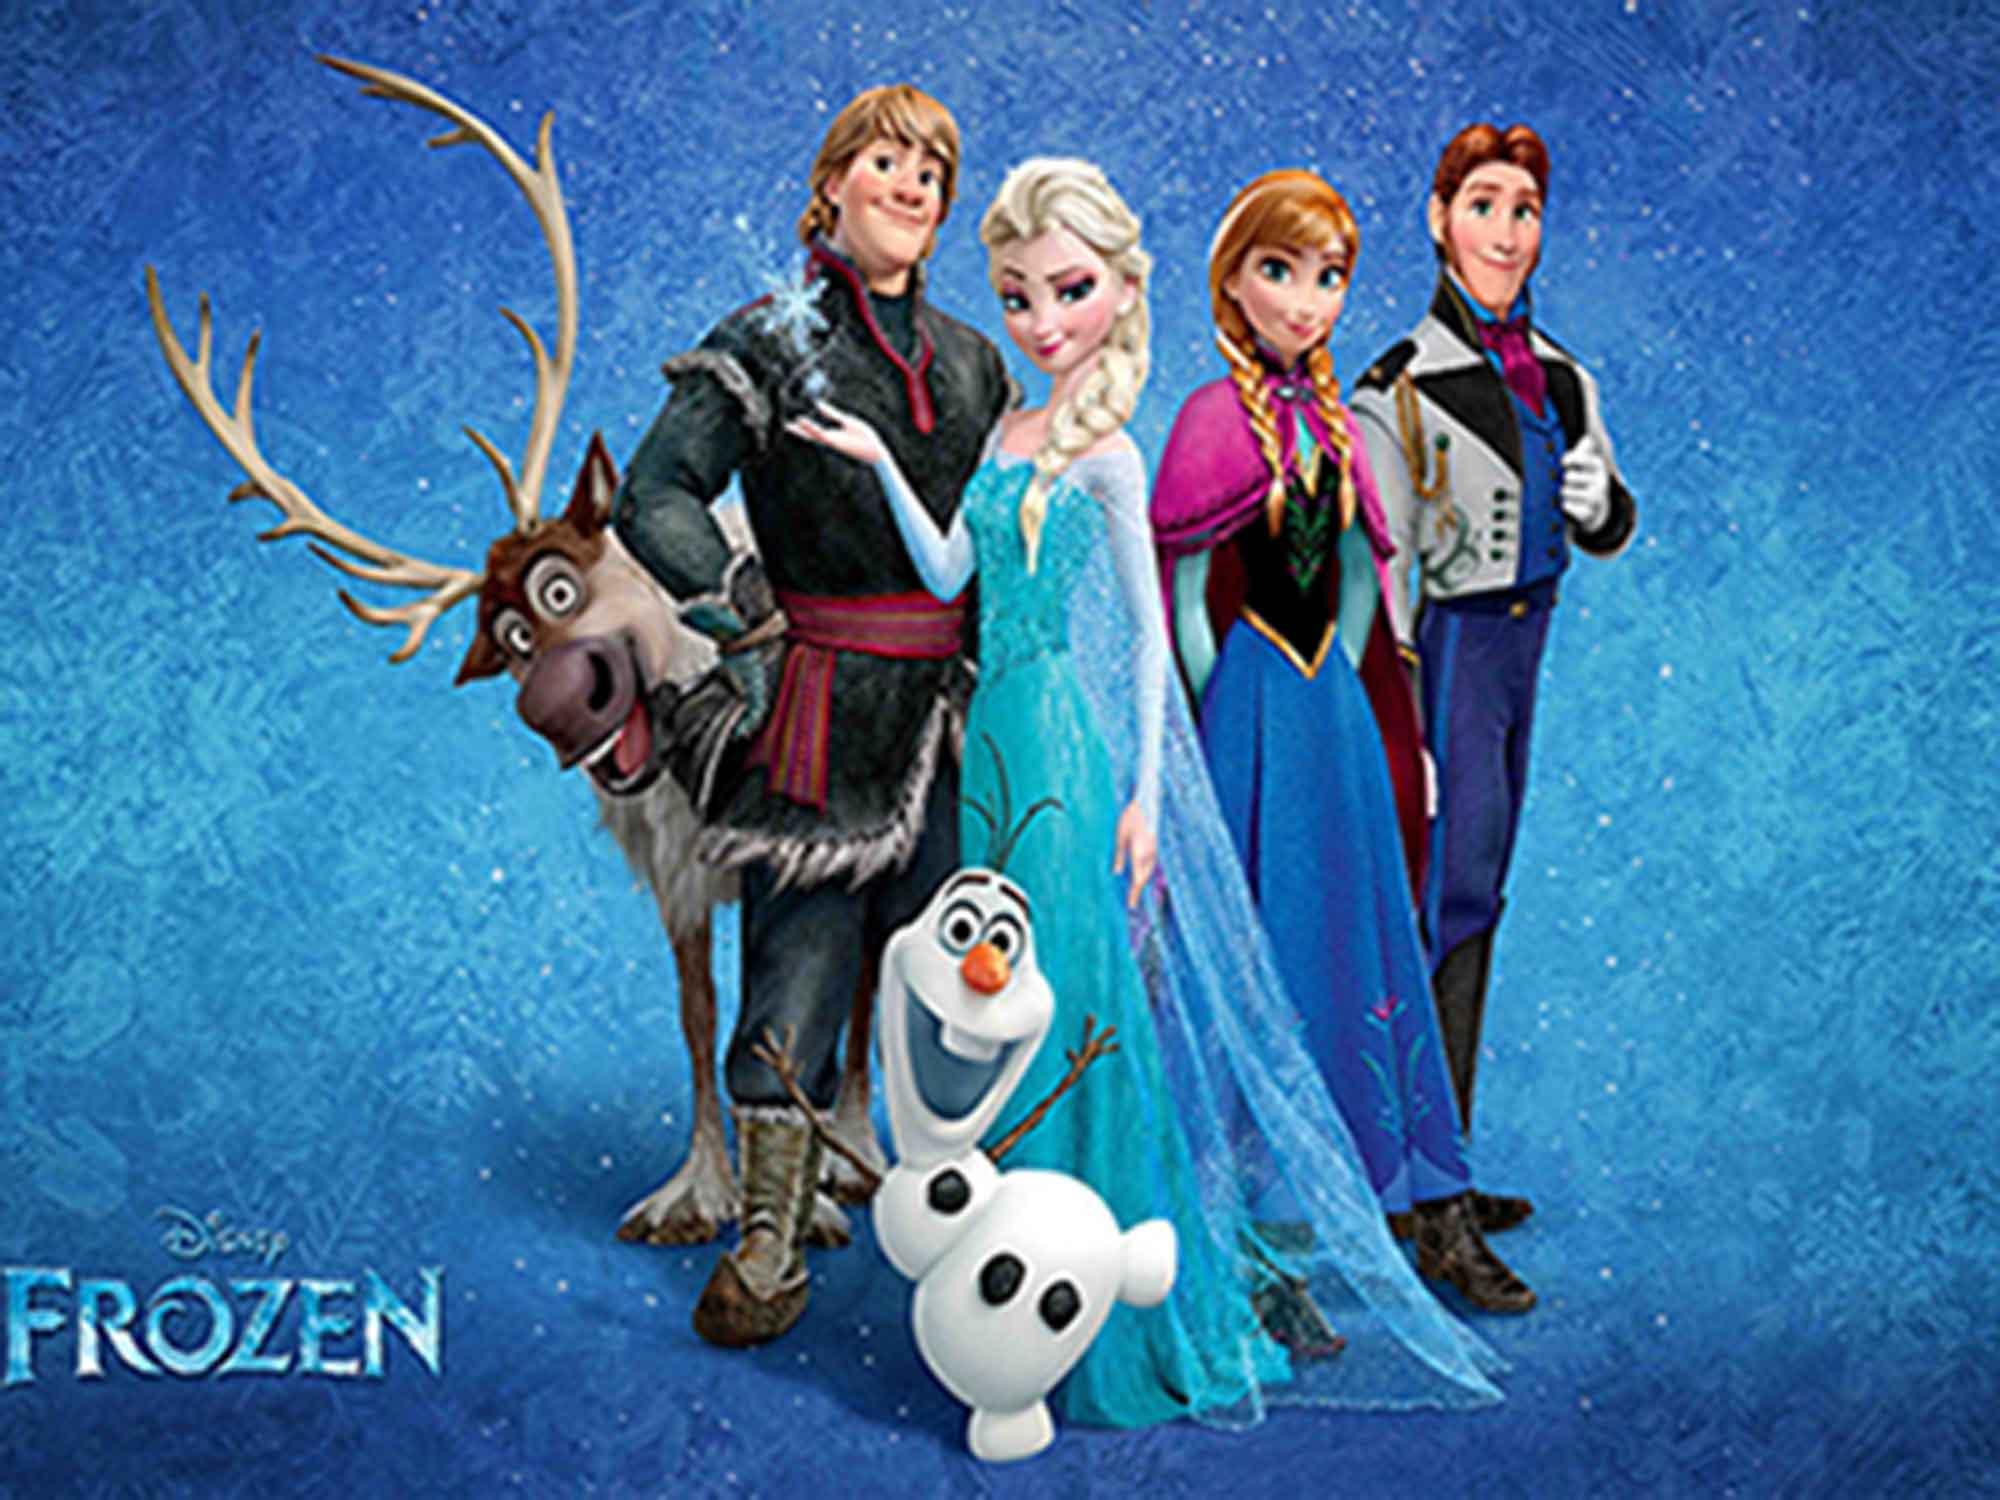 Papel de Parede Infantil Frozen 0013 - Papel de Parede para Quarto  - Paredes Decoradas